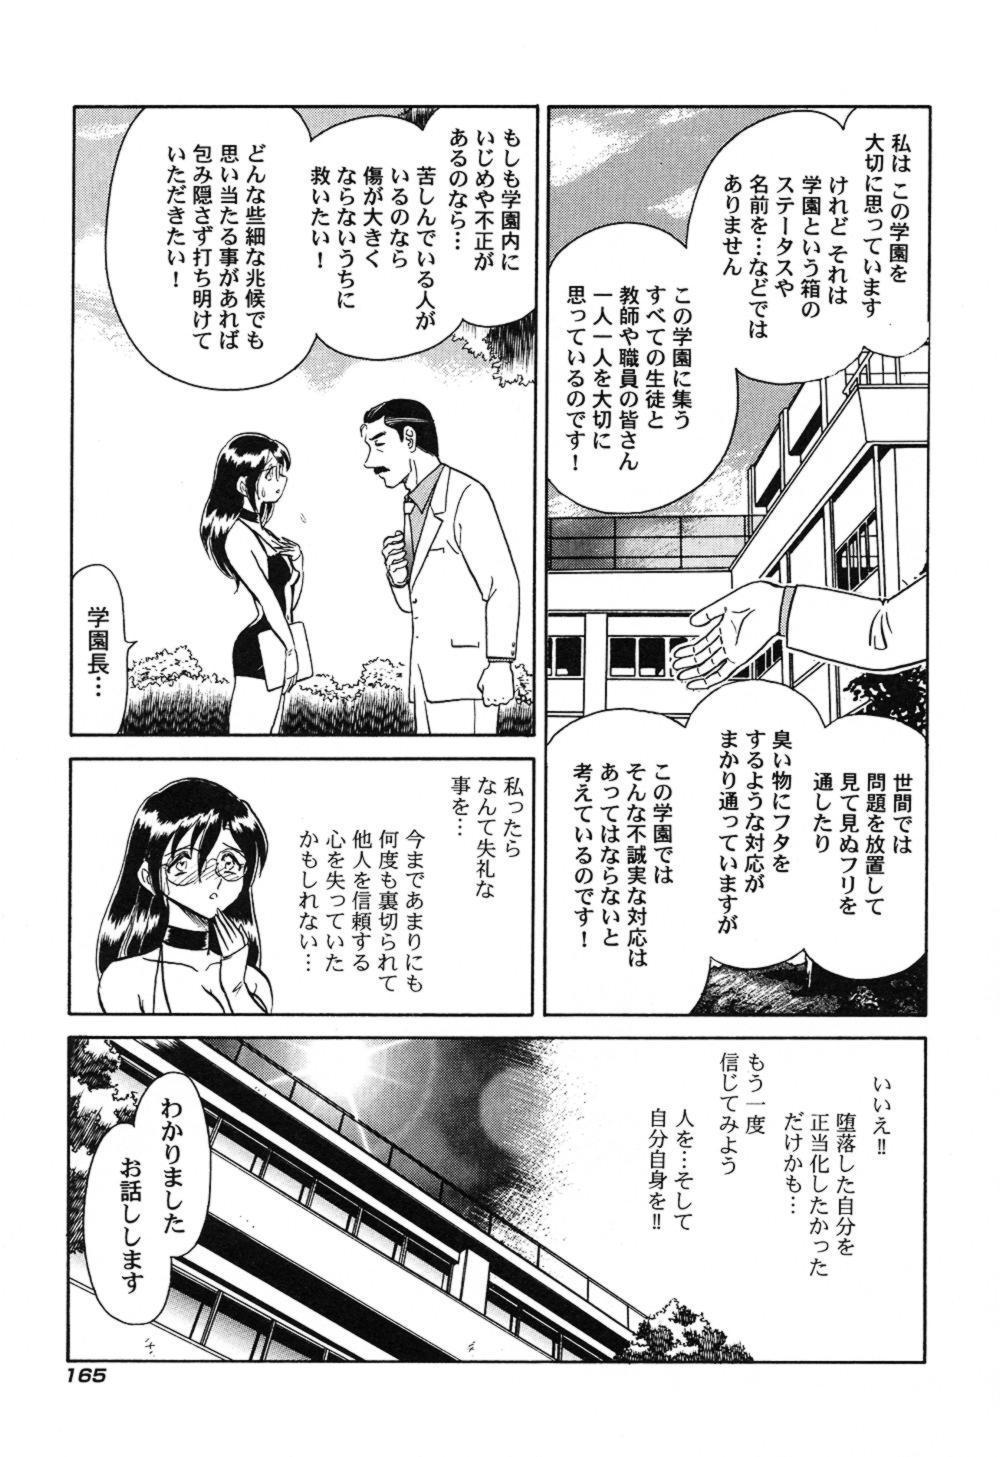 Hageshii Kagai Jugyou 167